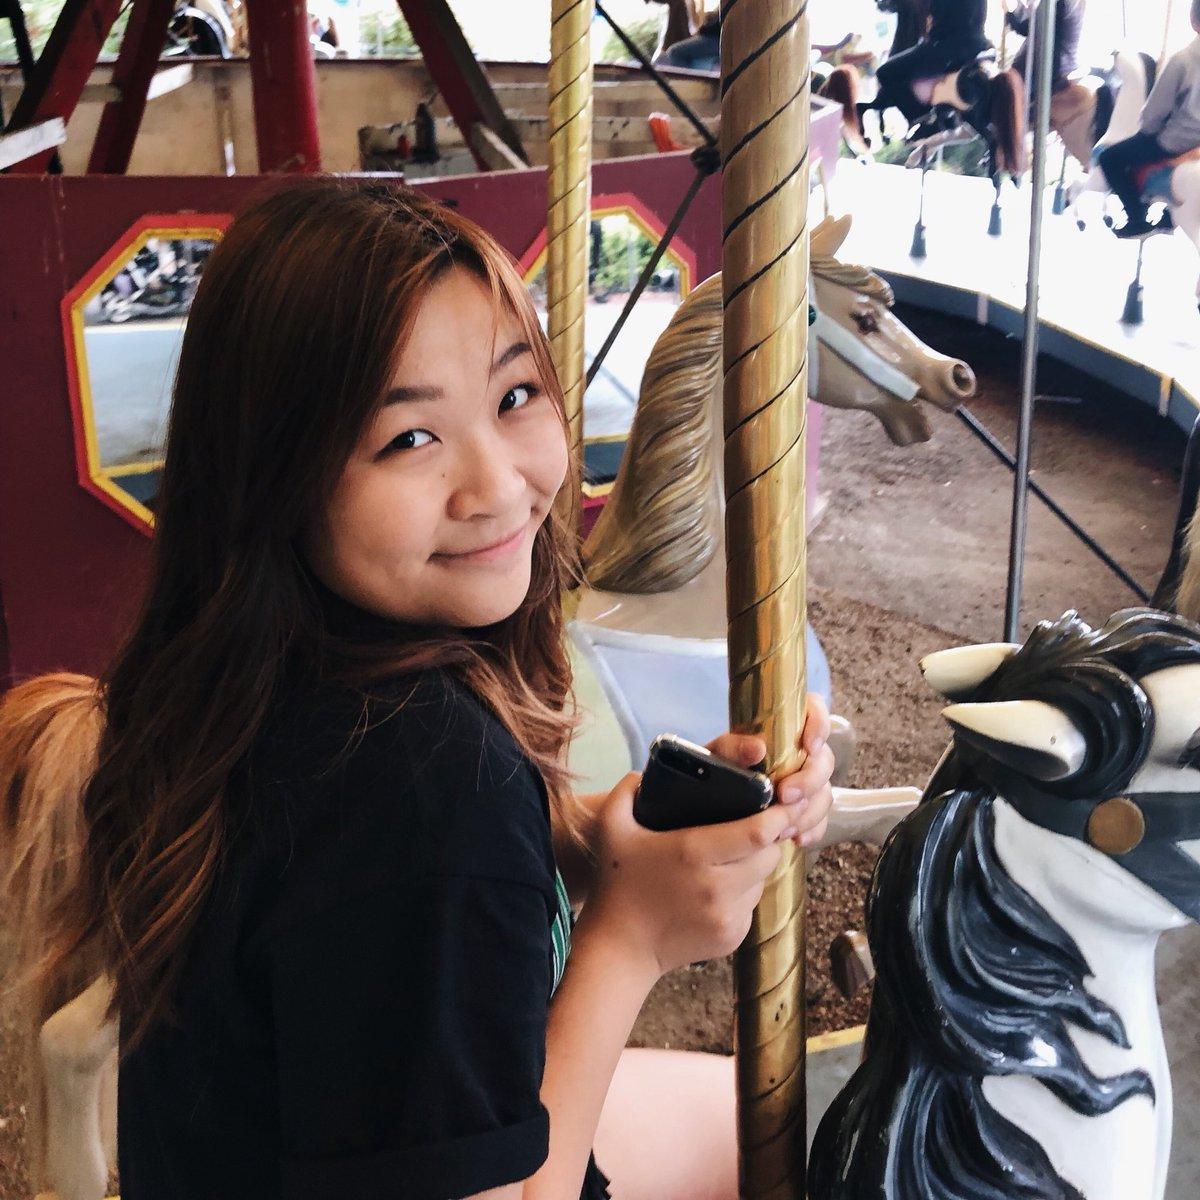 RT @heavenlyjaehyun: I never take selfies so here's me on a carousel #NCTZenSelcaDay #jaehyun https://t.co/lVPv8uALZo